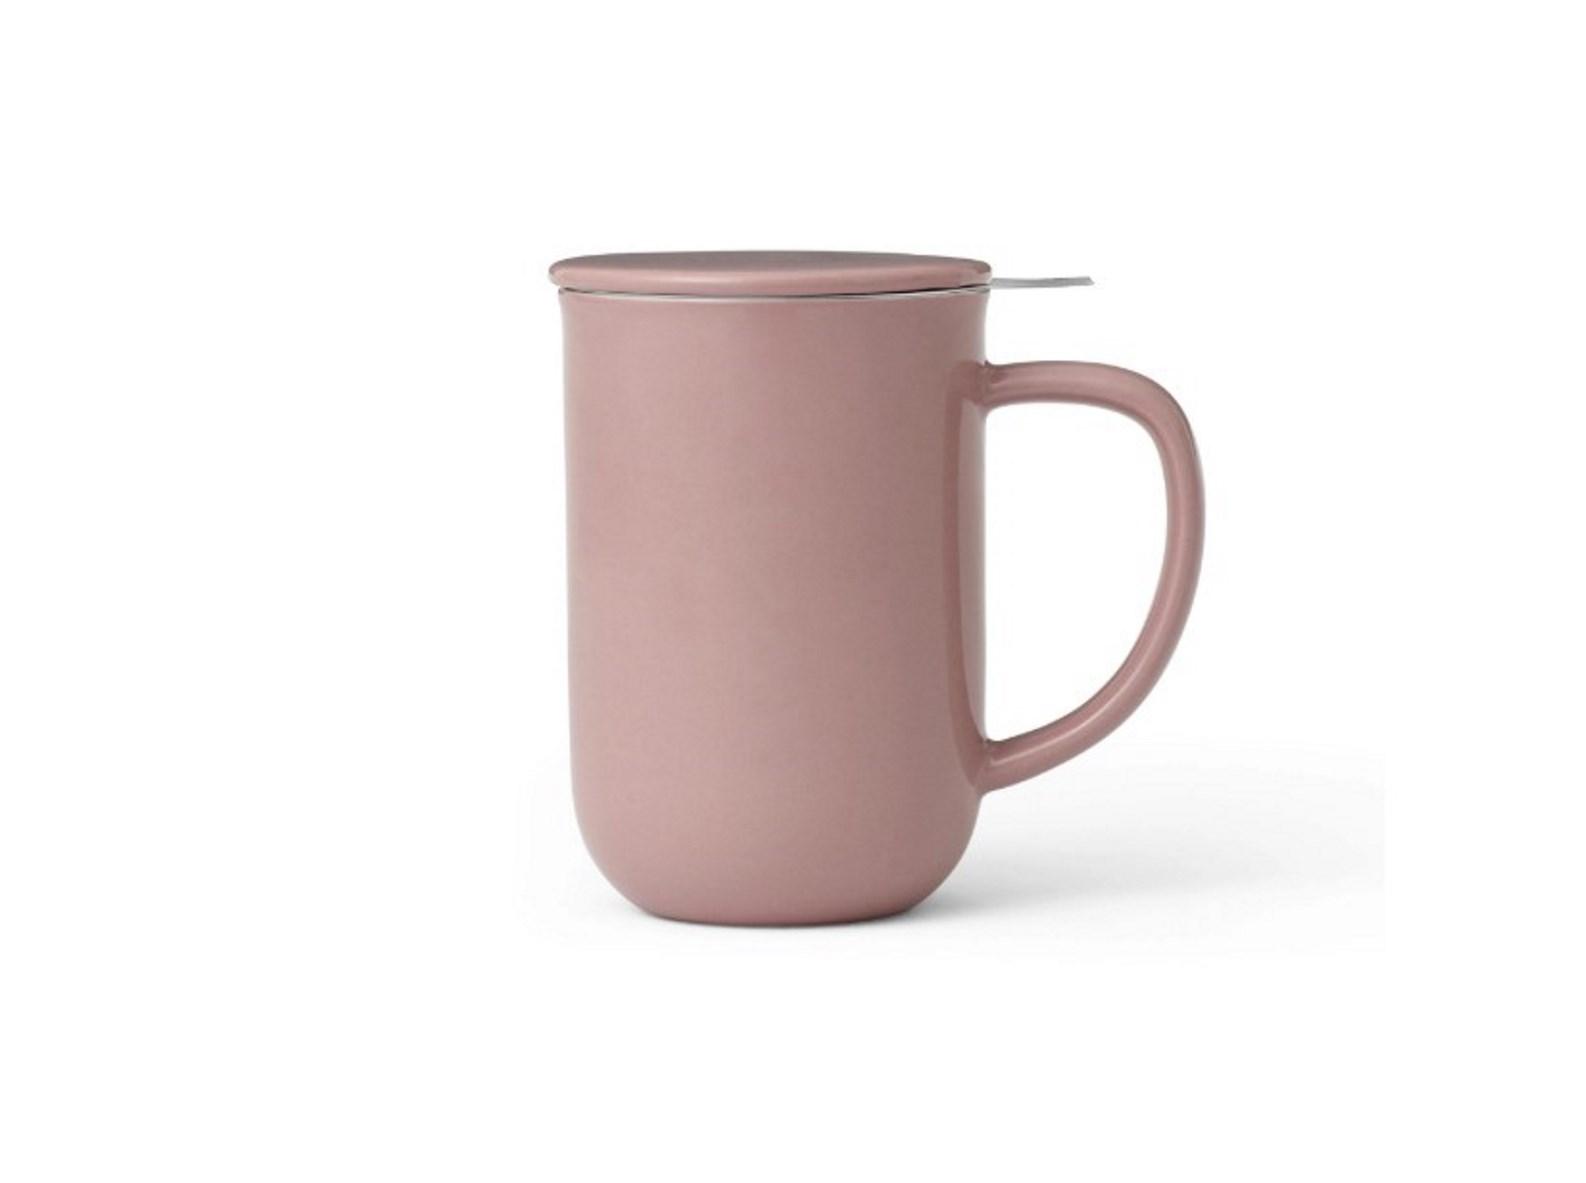 Онлайн каталог PROMENU: Кружка для чая с ситечком Viva Scandinavia MINIMA Stone rose, объем 0,55 л, розовый                               V77550